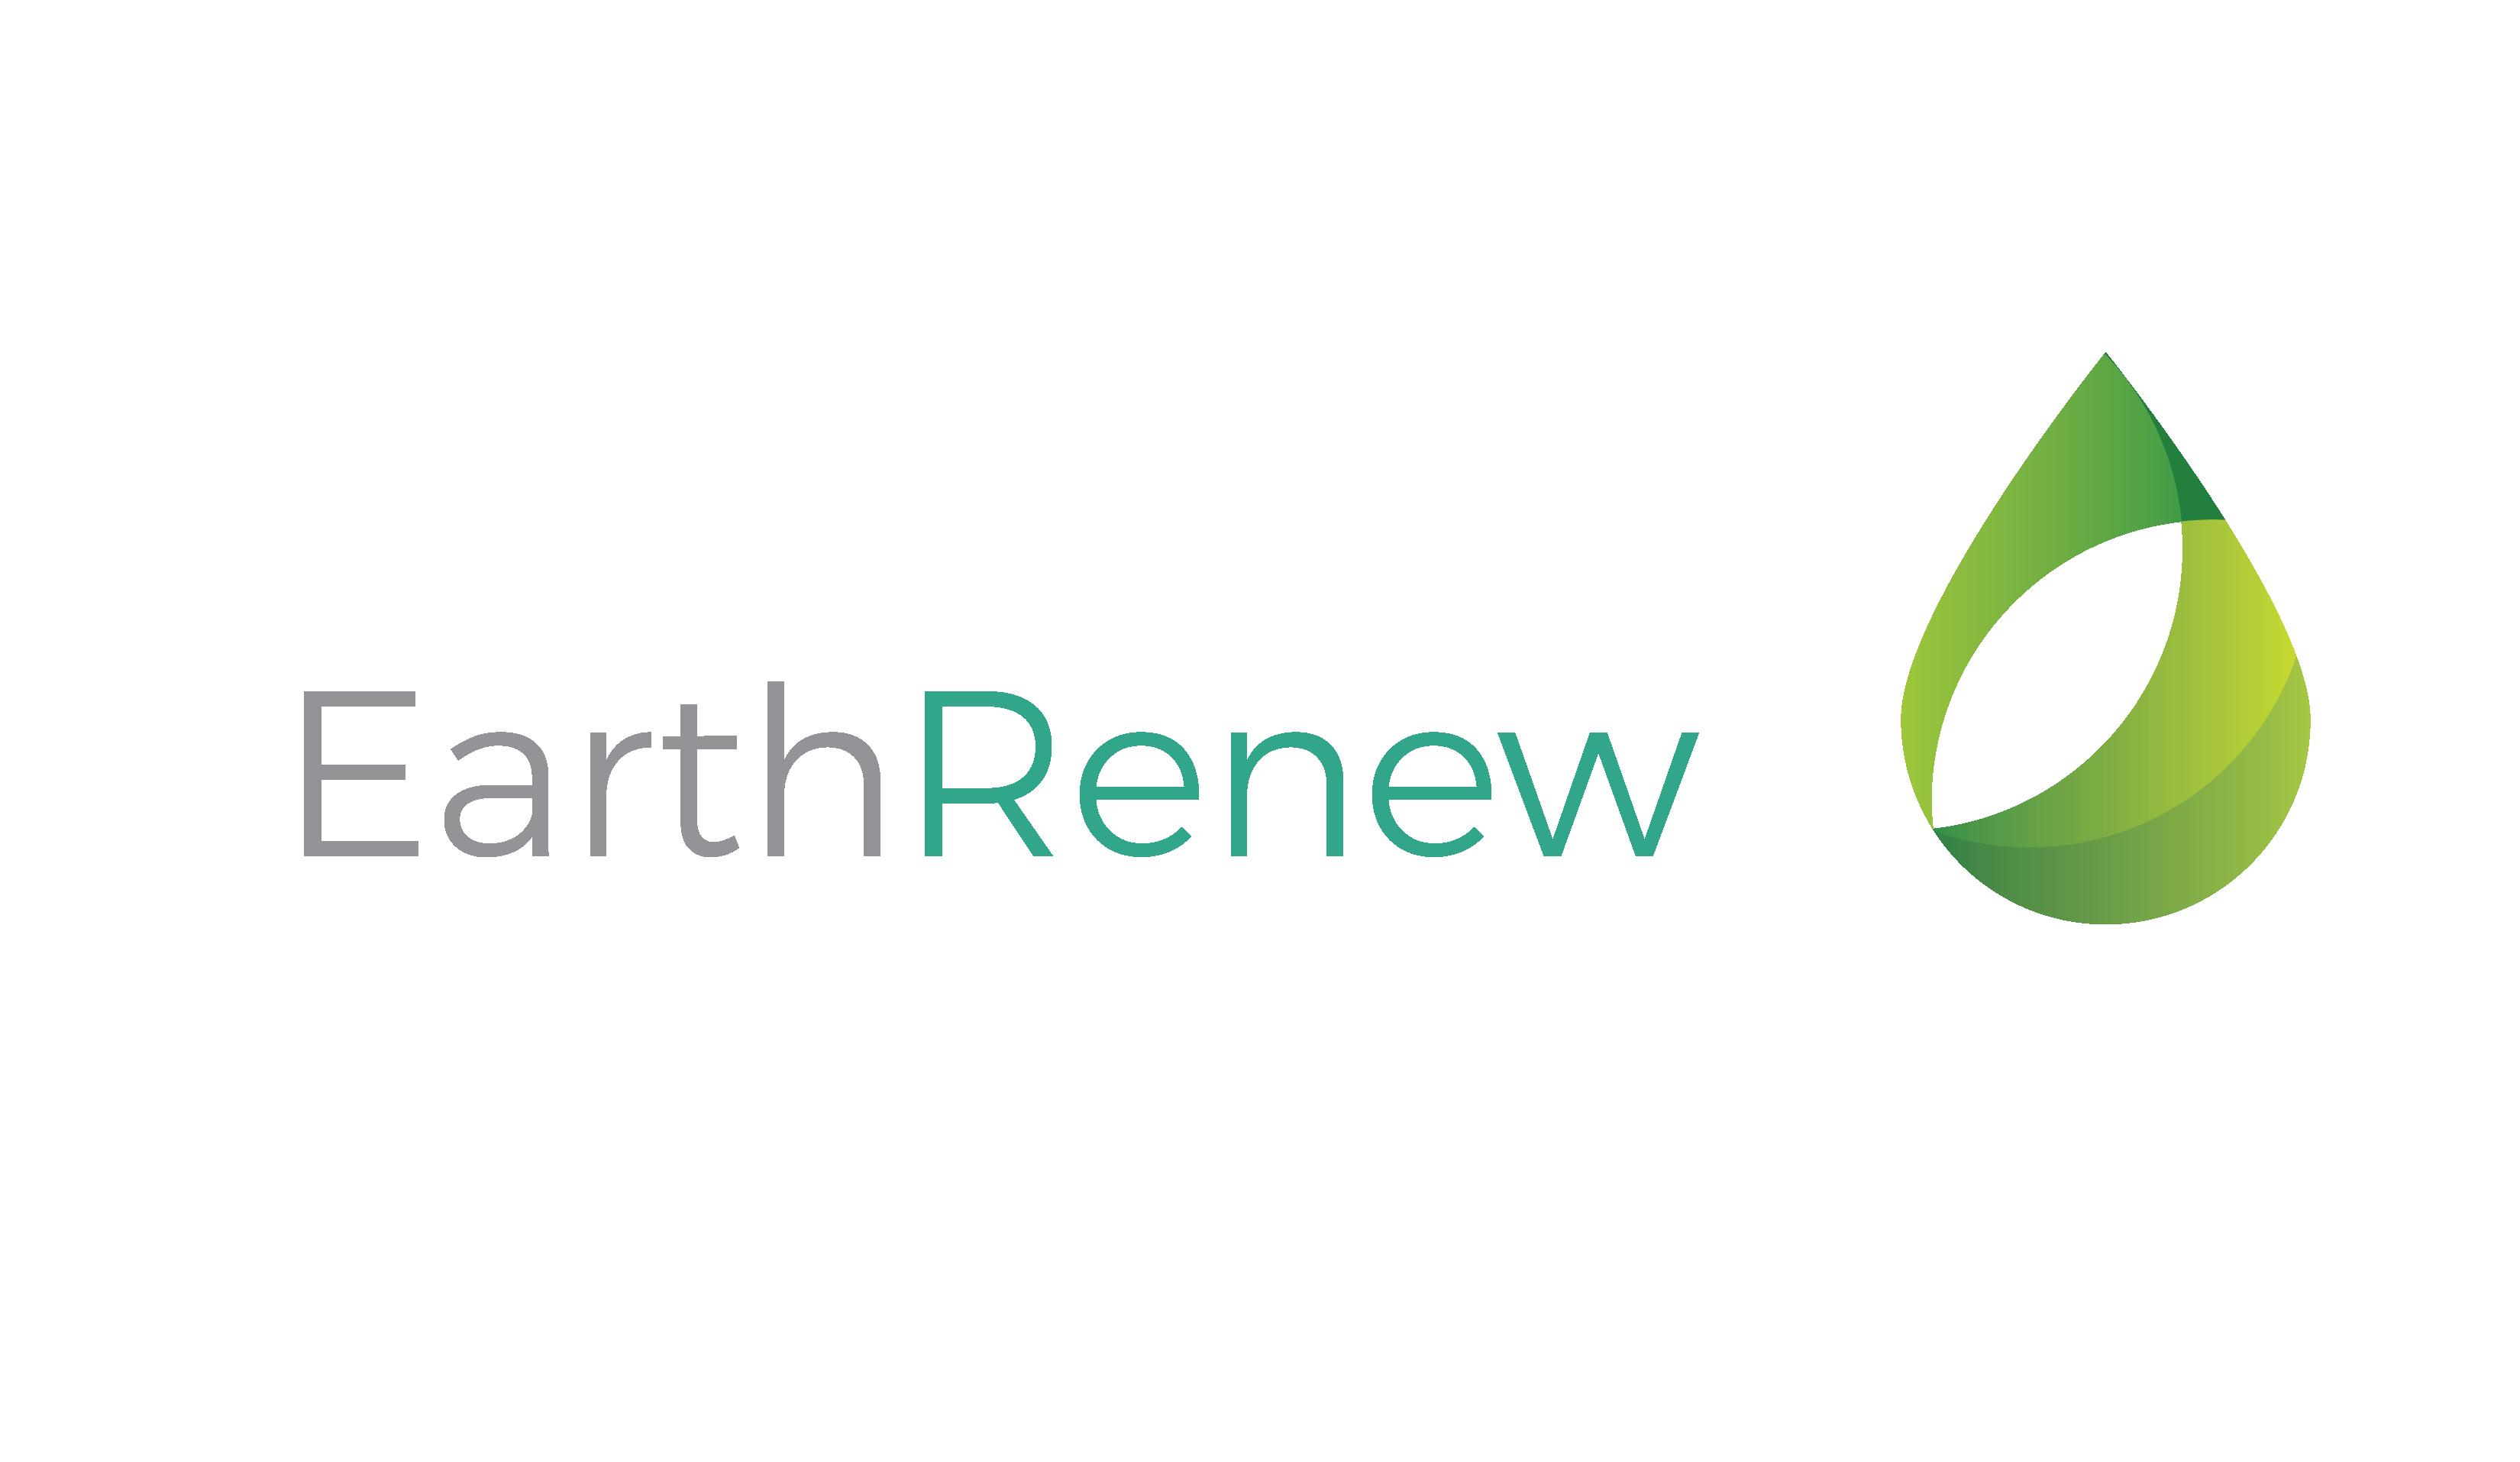 EarthRenew Receives Key U.S